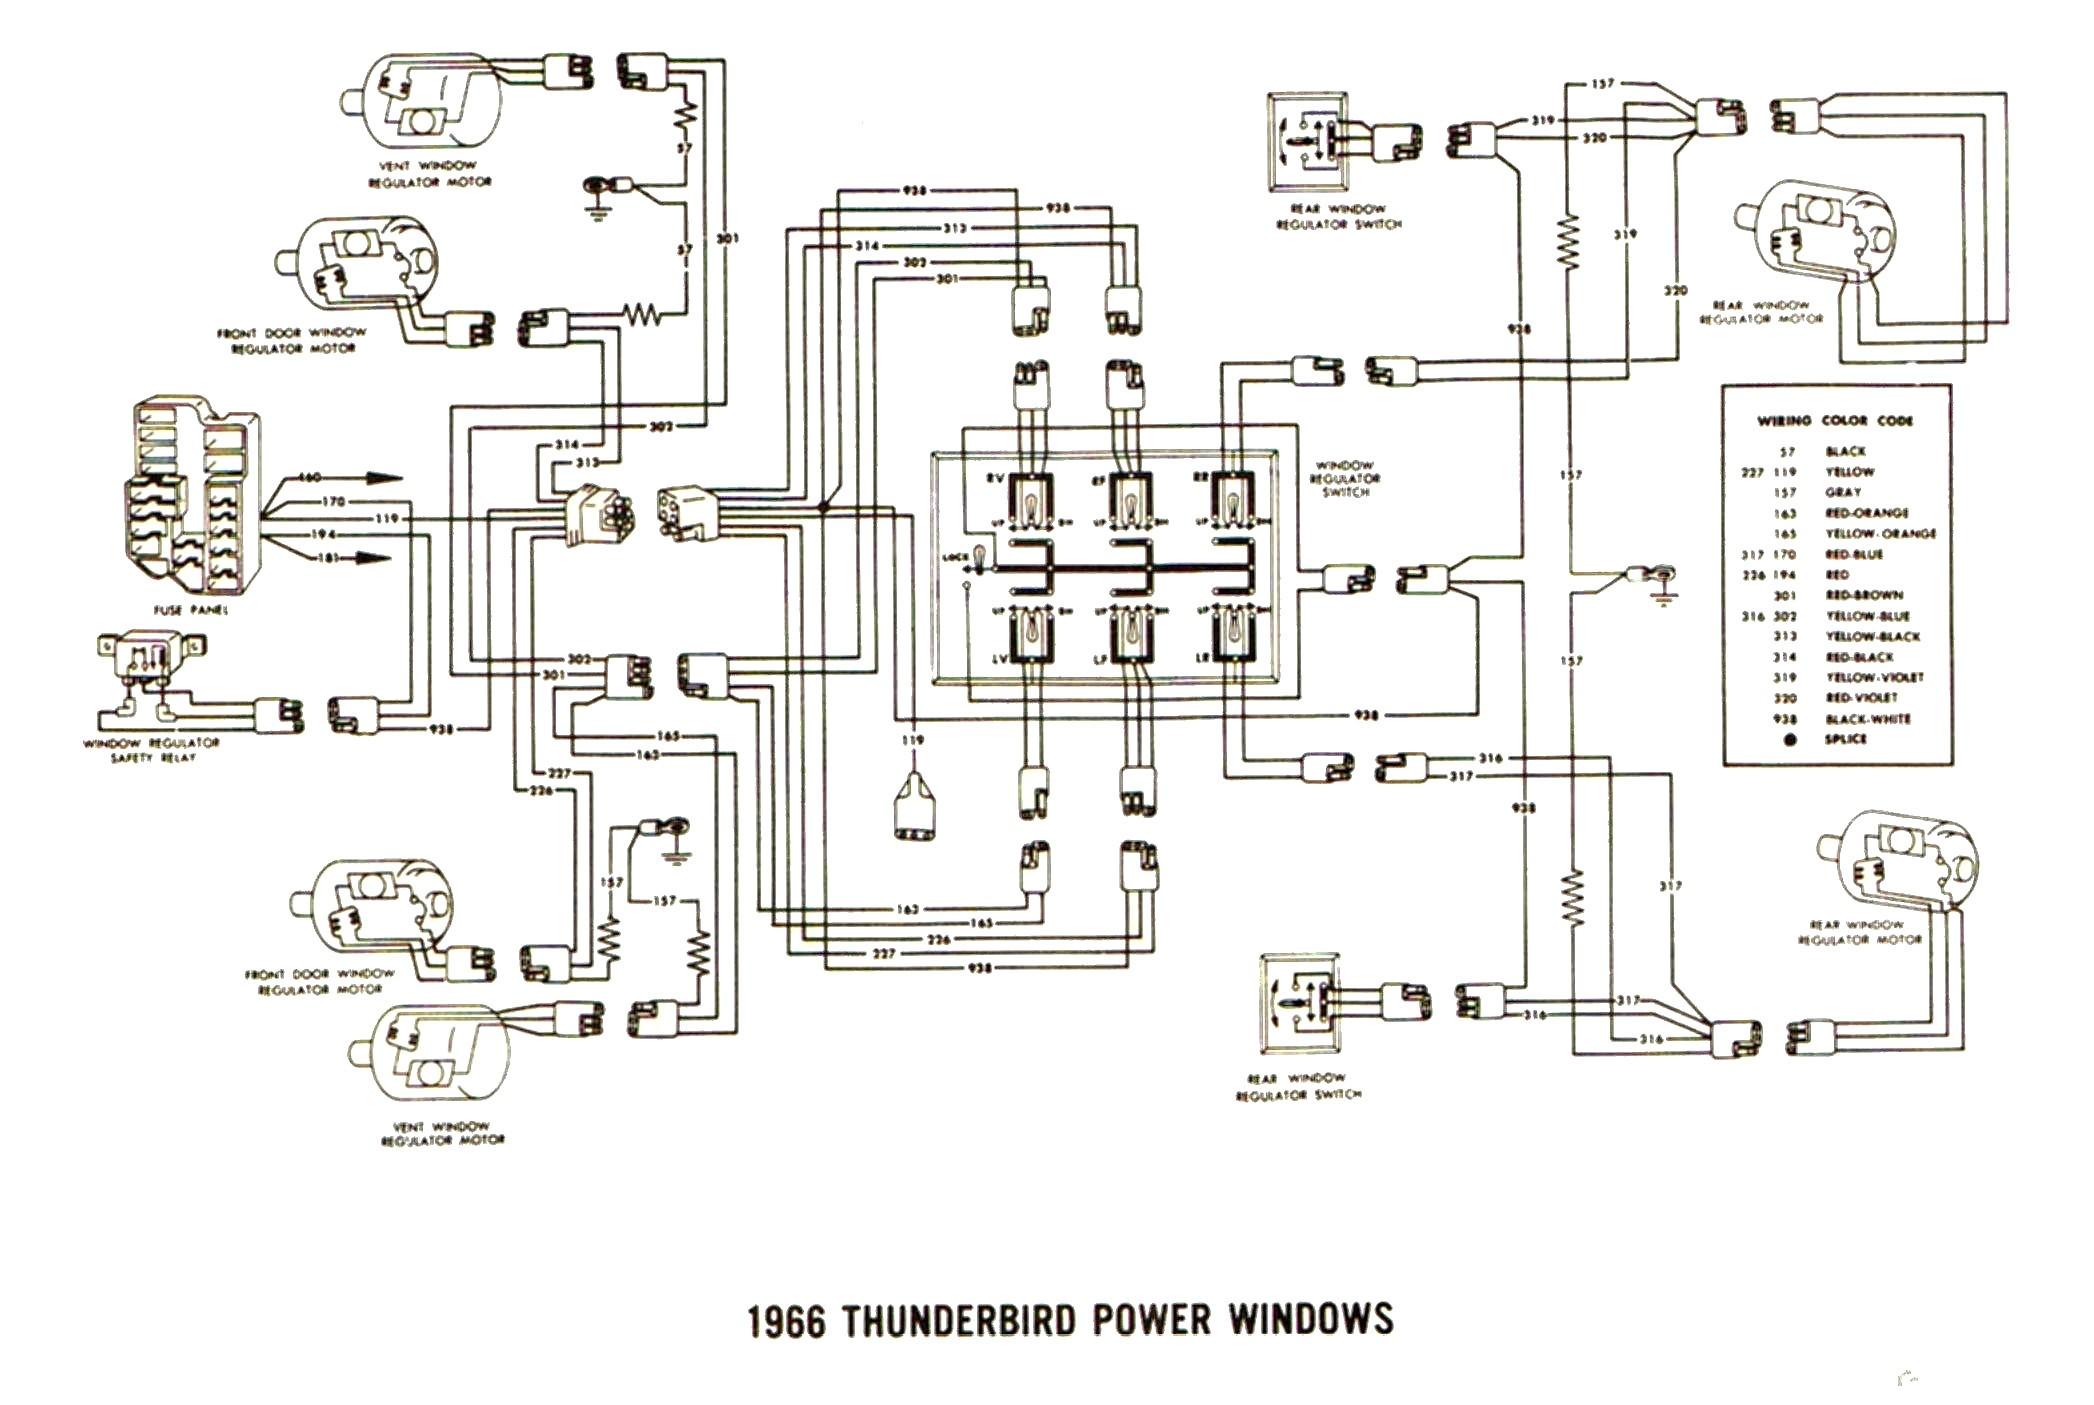 Wiring Diagram for to 35 Ferguson Diagram] 1949 Harry Ferguson Tractor Wiring Diagram Full